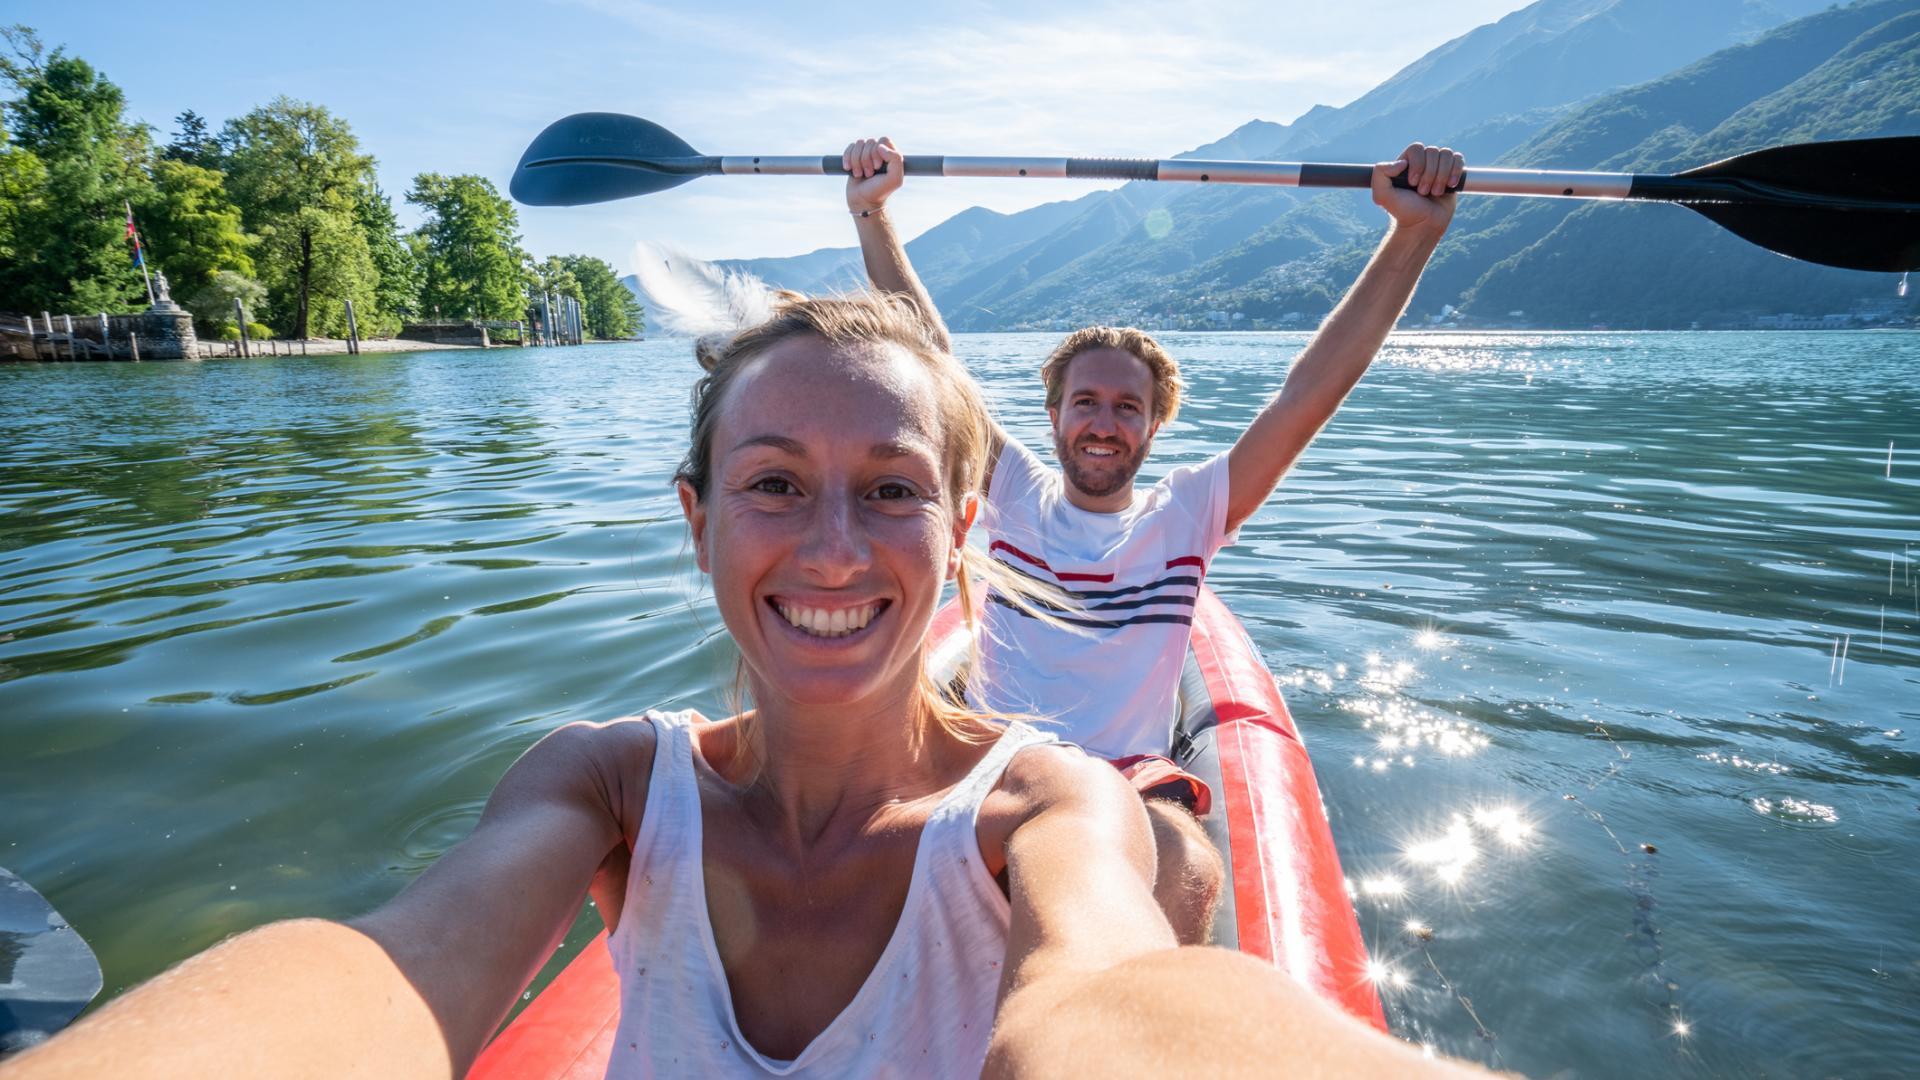 Bergsee Kanu Paddeln Natur Paar Urlaub